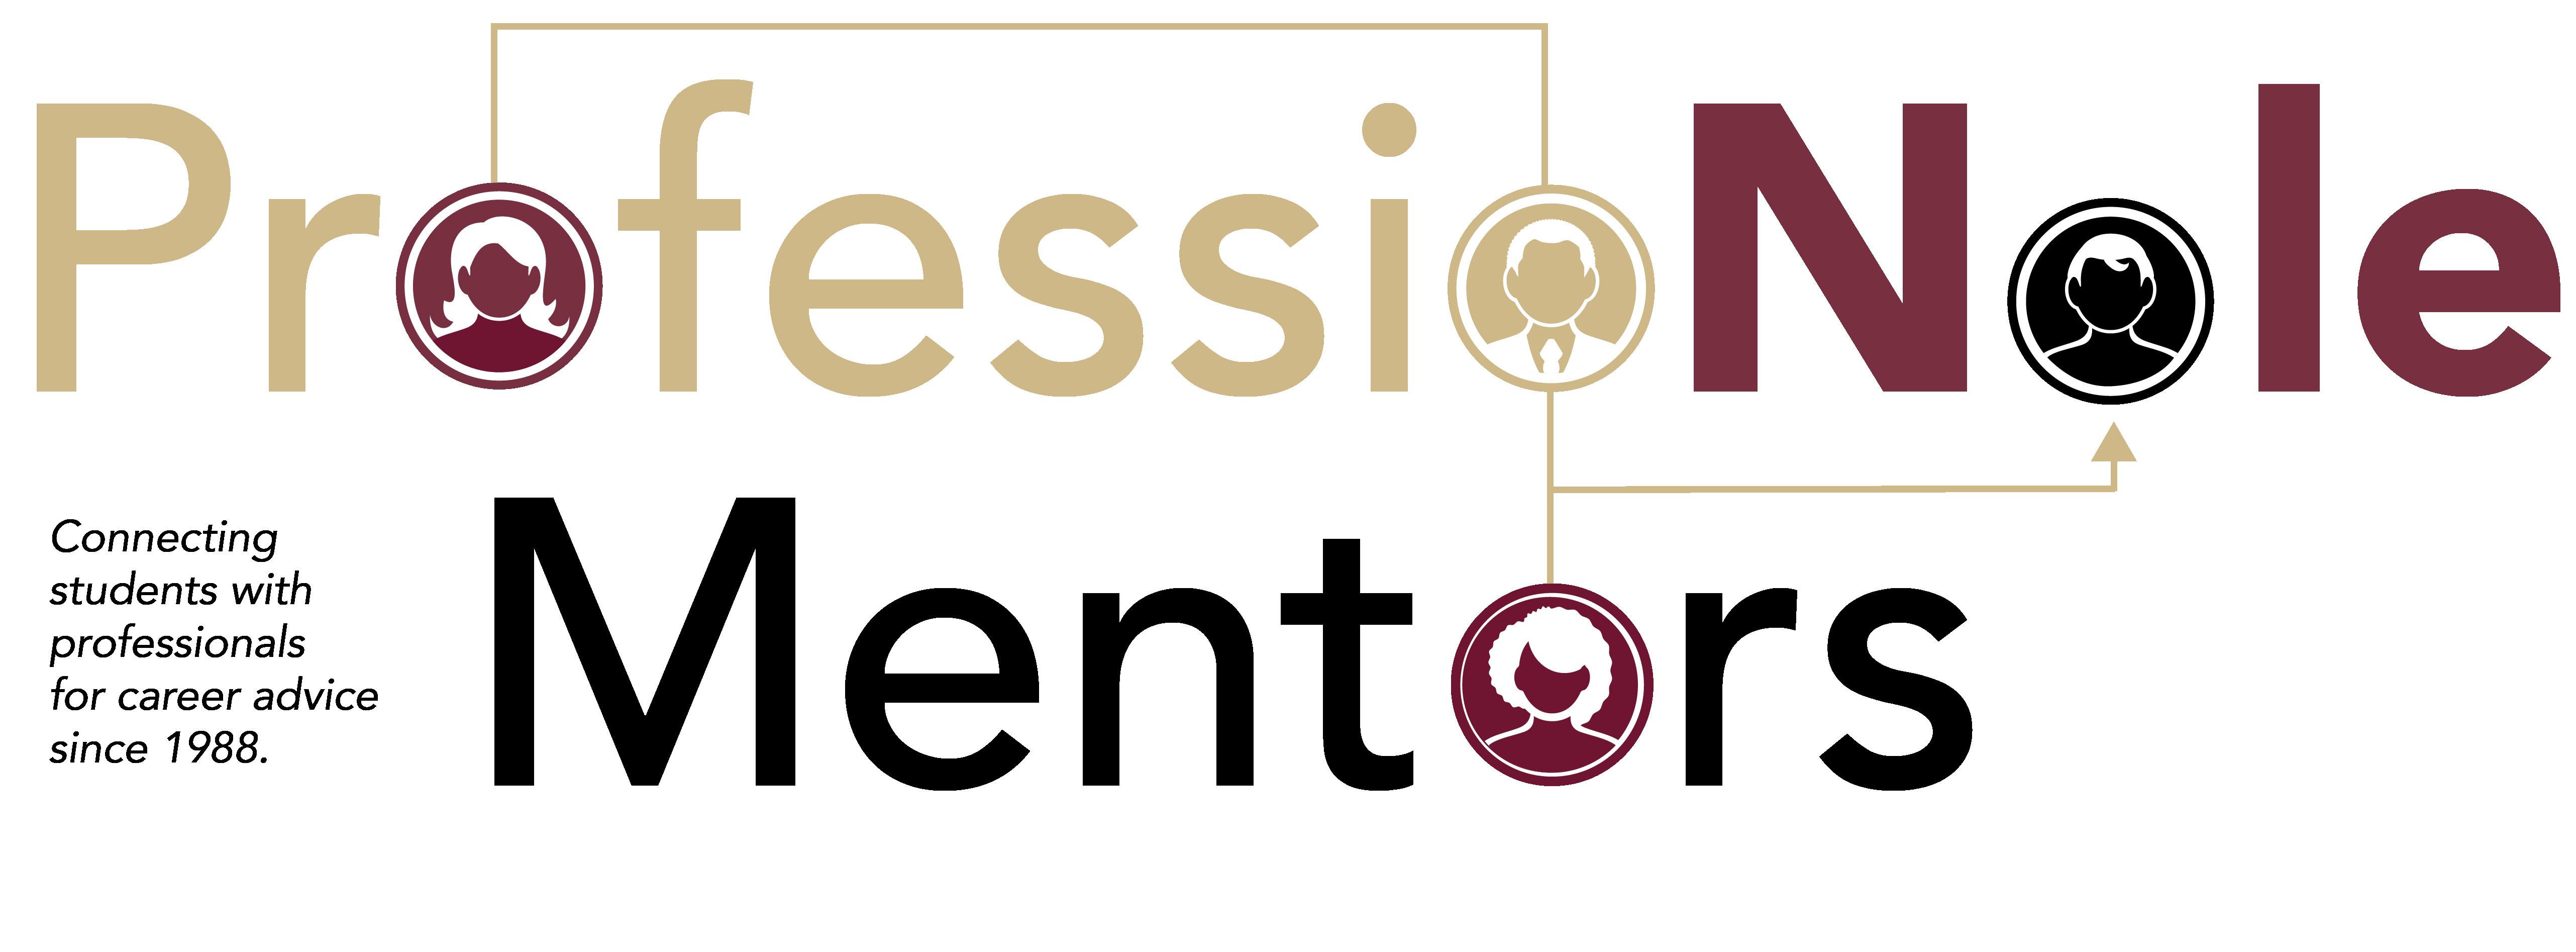 Professionole Mentors Program The Career Center